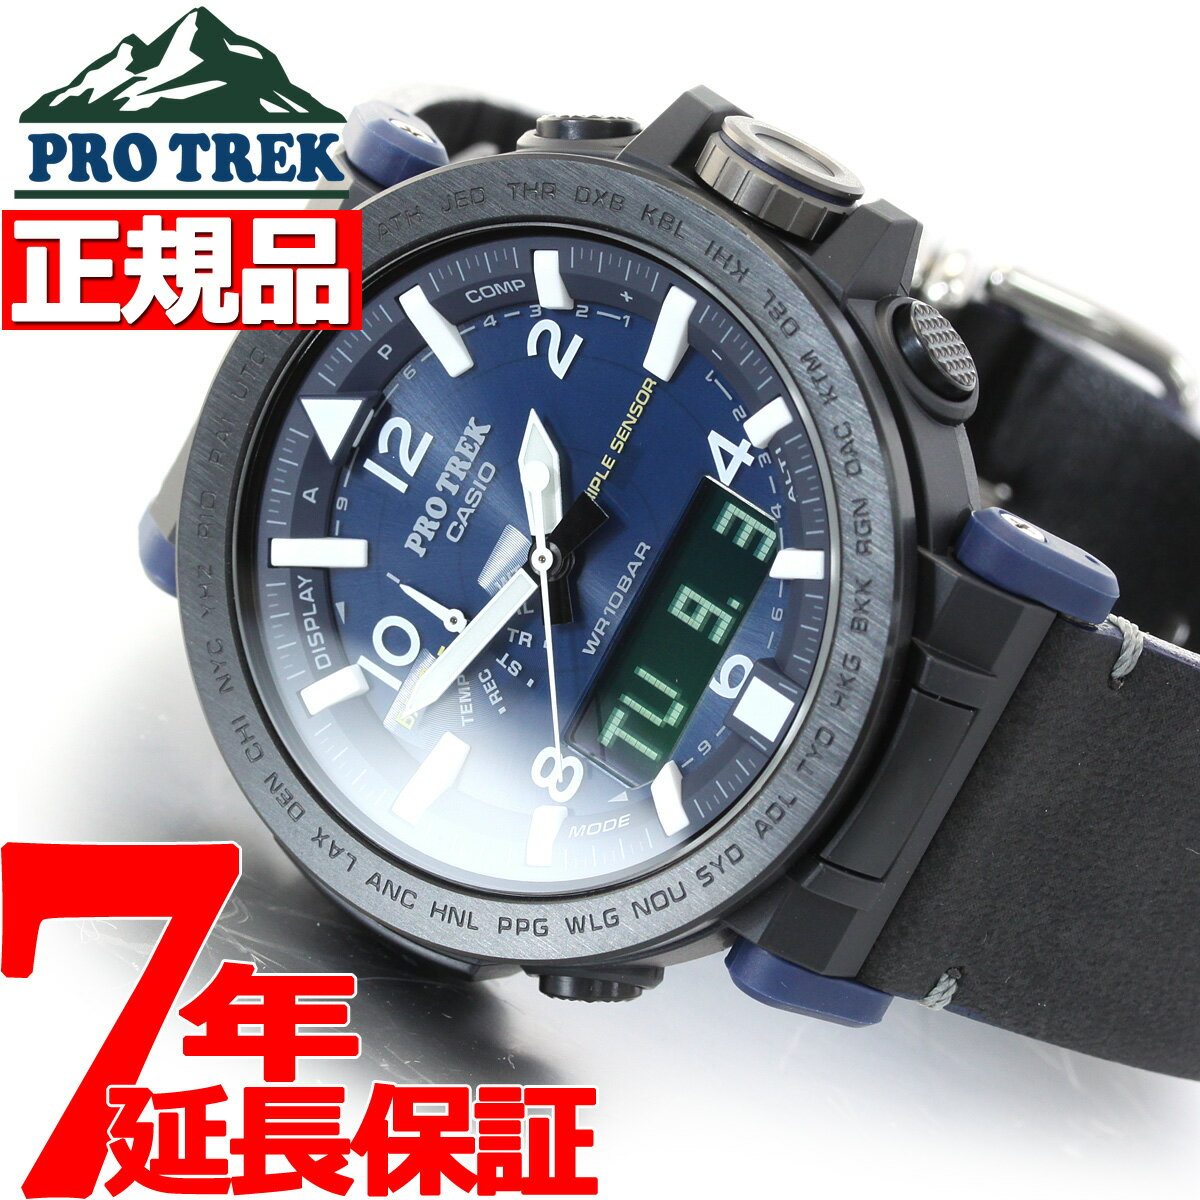 腕時計, メンズ腕時計 30036302359 CASIO PRO TREK NAVY BLUE SERIES PRG-650YL-2JF